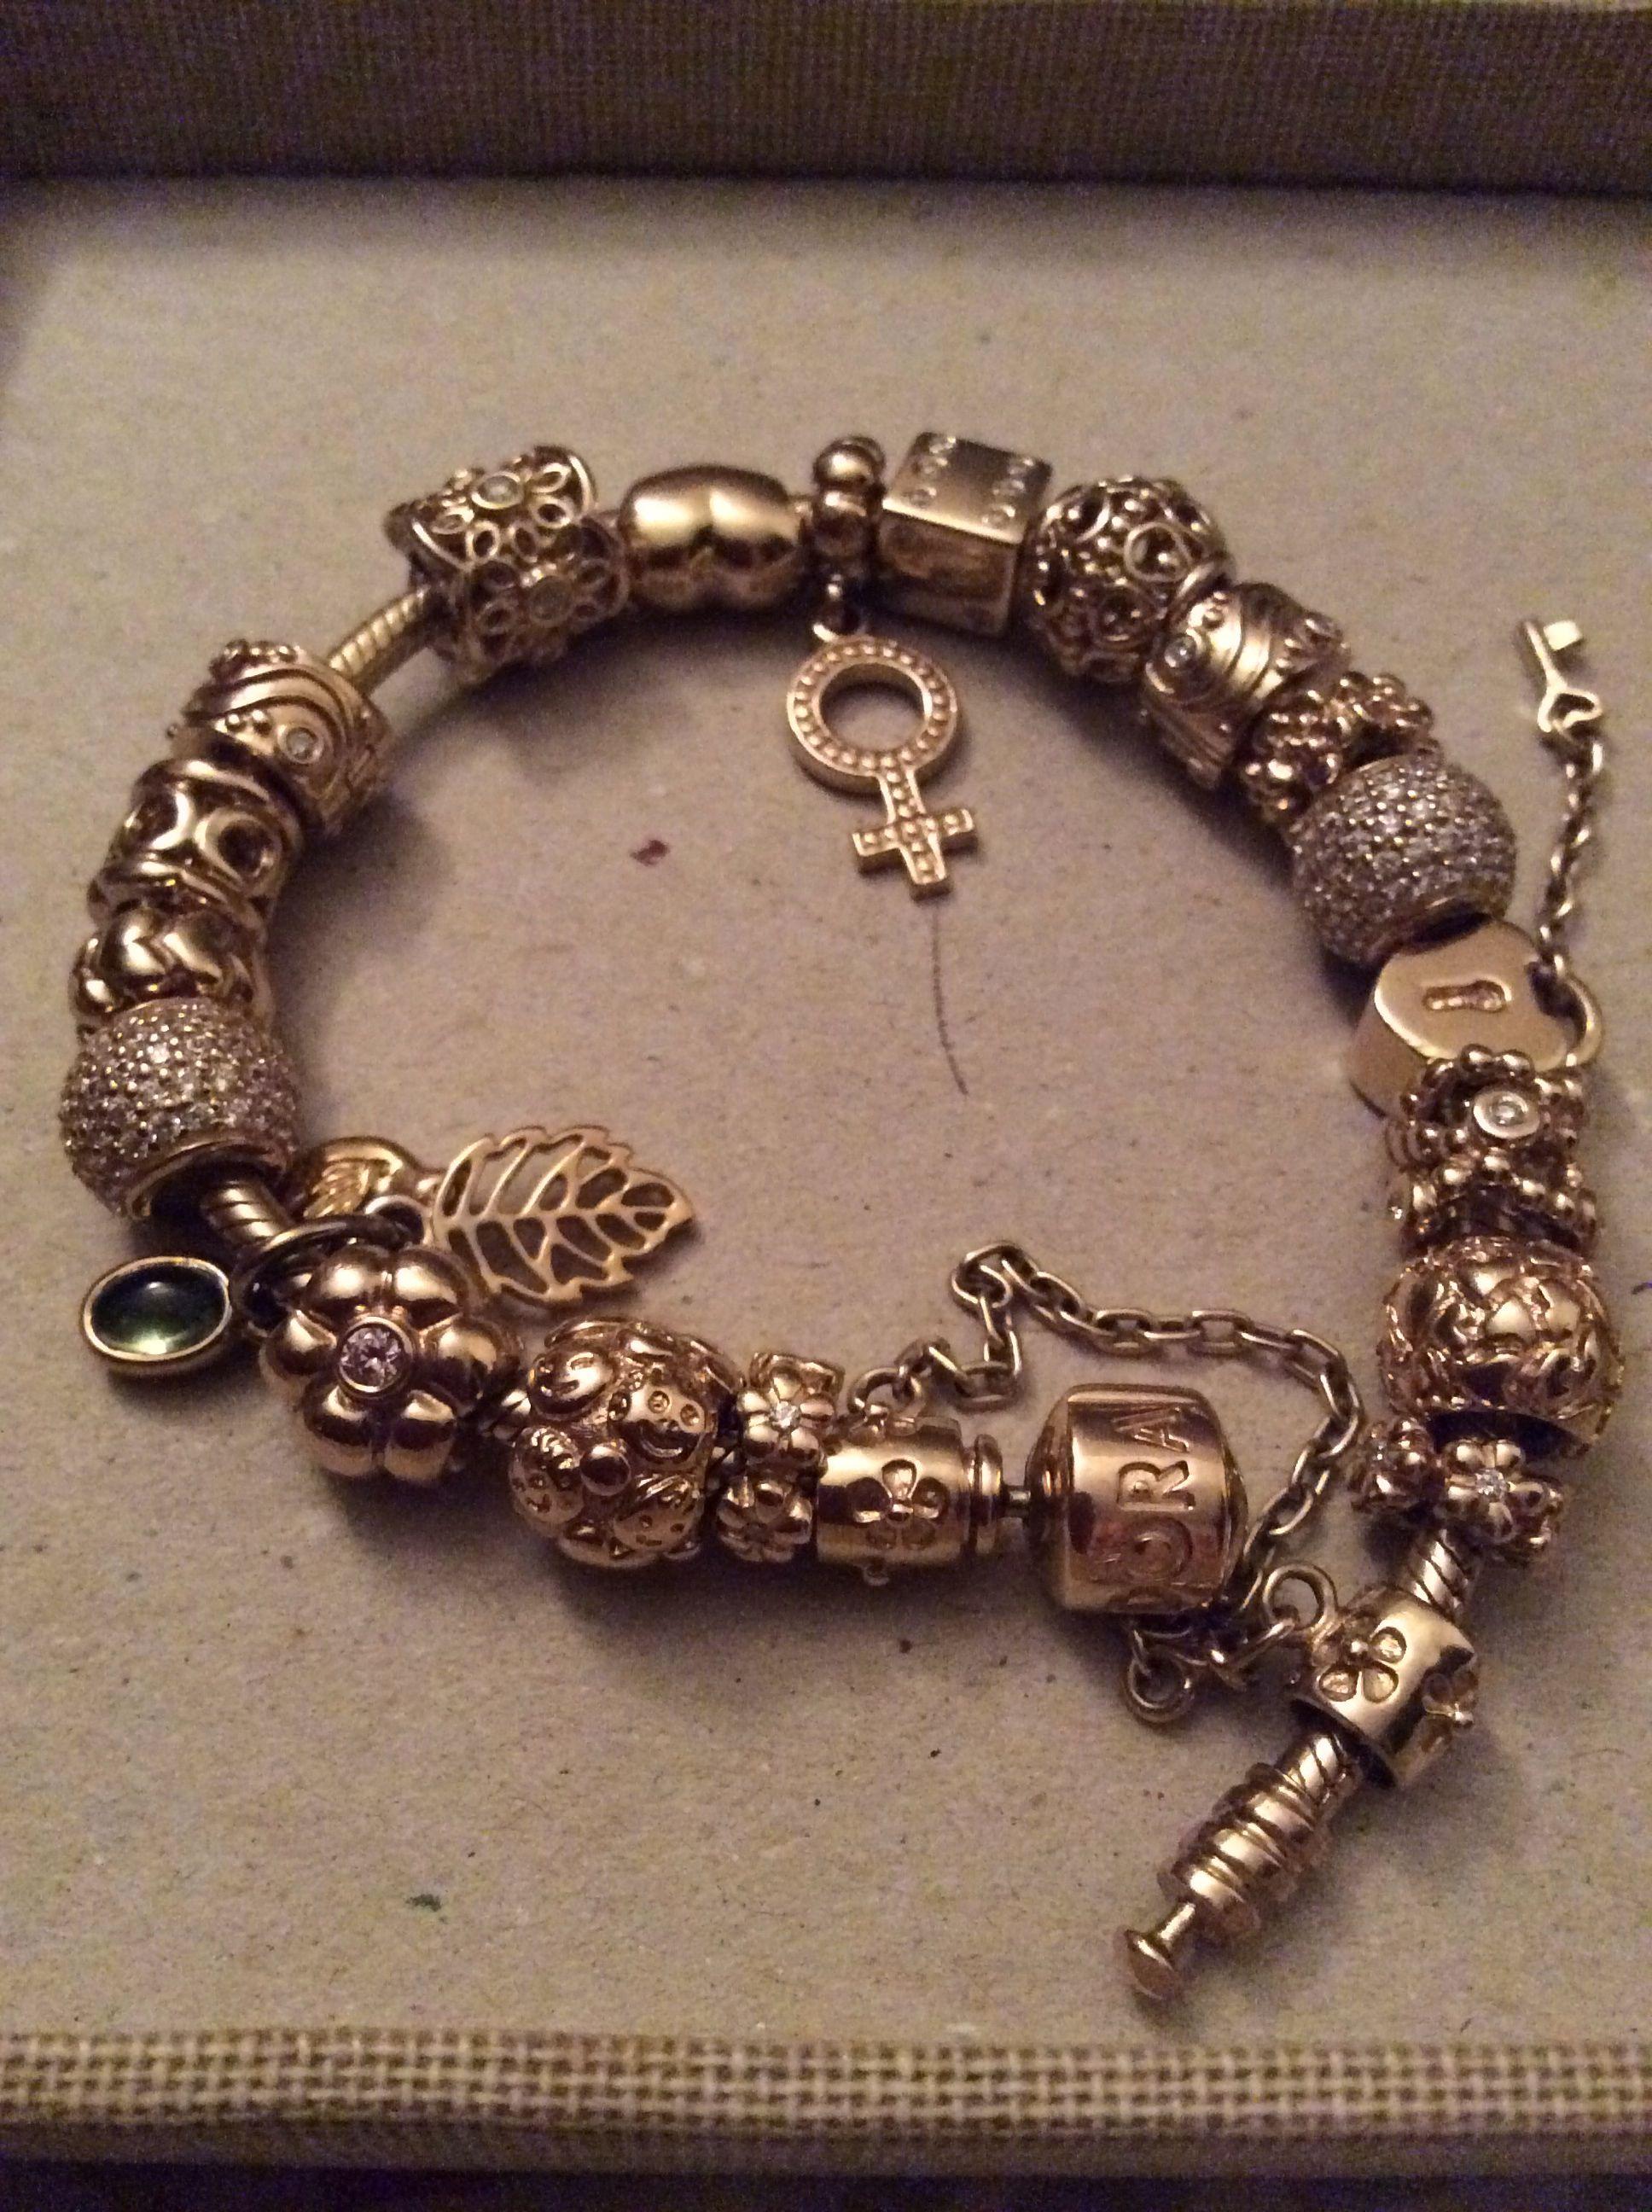 Gold pandora pandora bracelets pandora bracelet